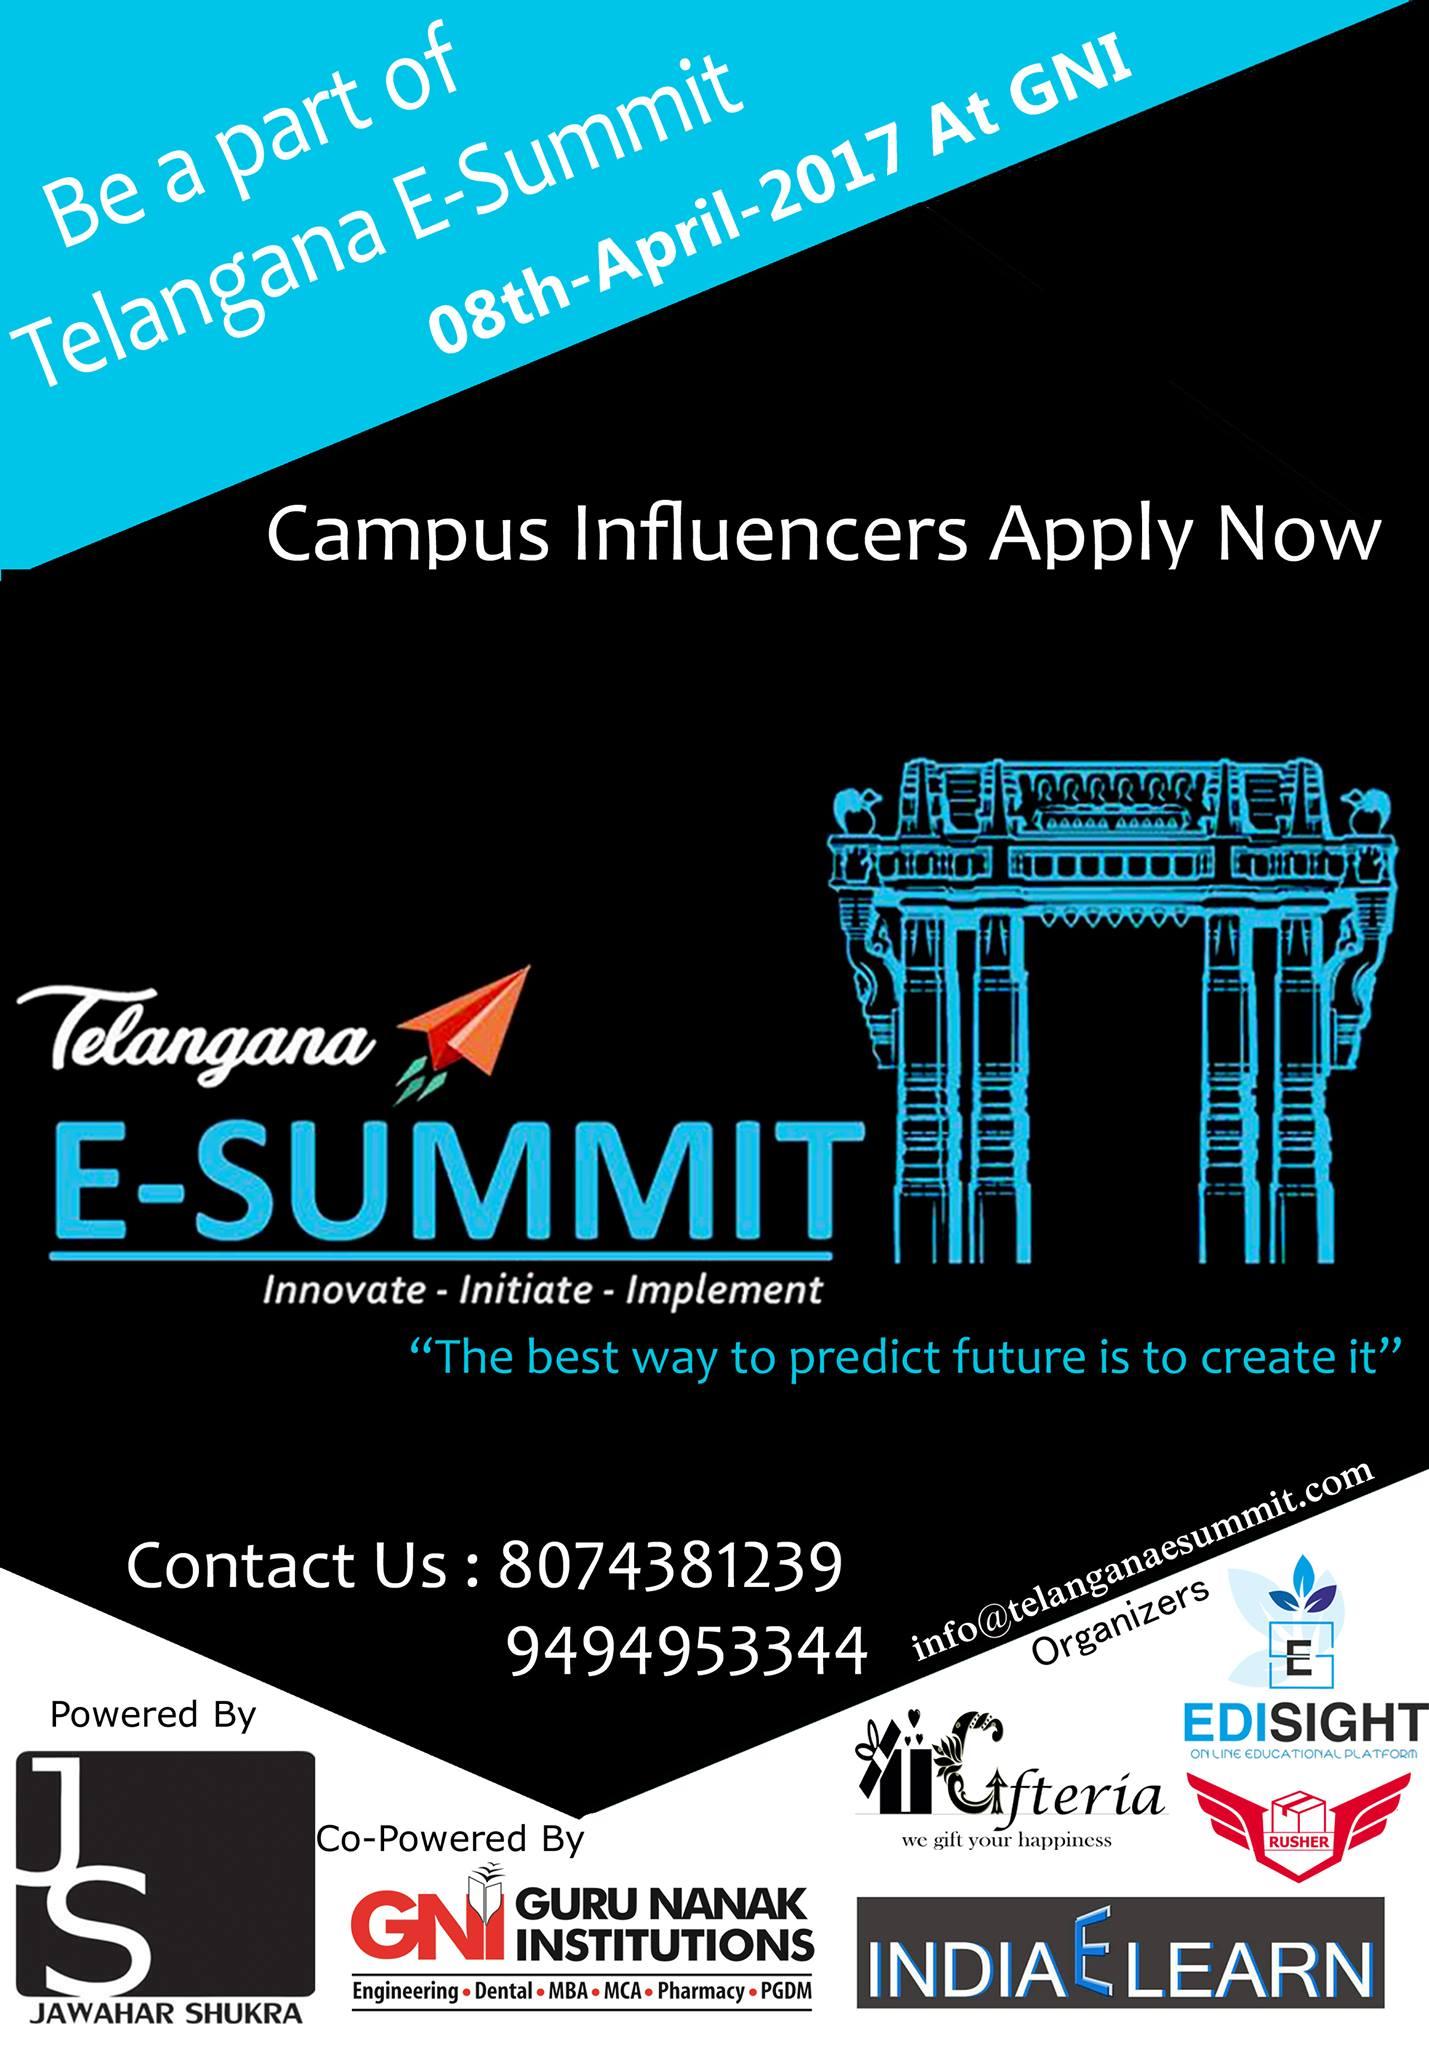 telangana-e-summit